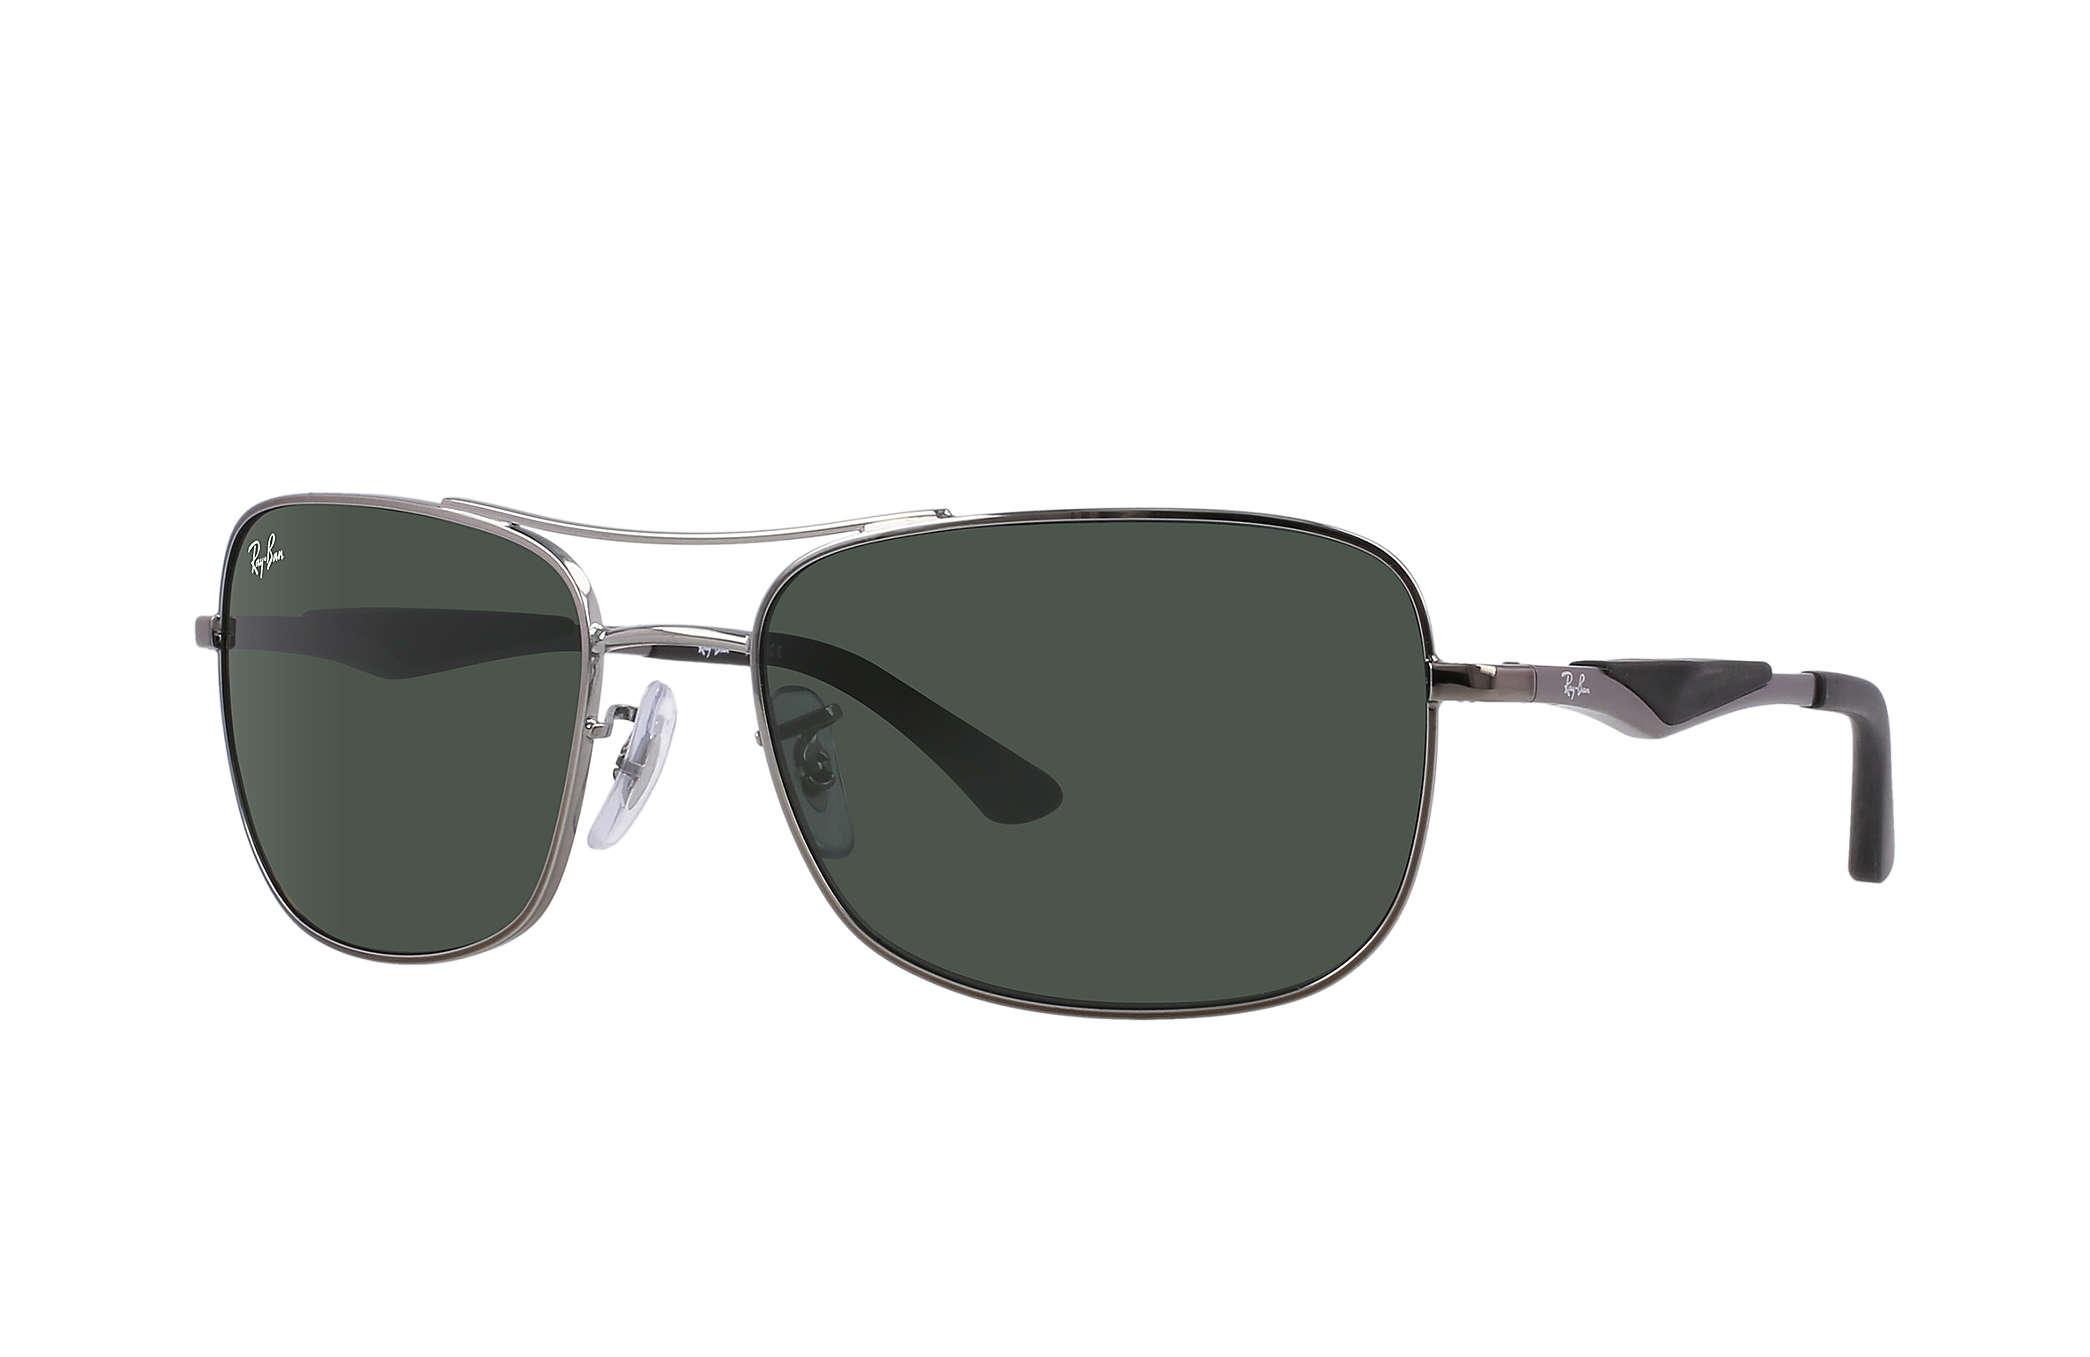 40338c460d9f Ray-Ban RB3515 Gunmetal - Metal - Green Lenses - 0RB3515004 7161 ...